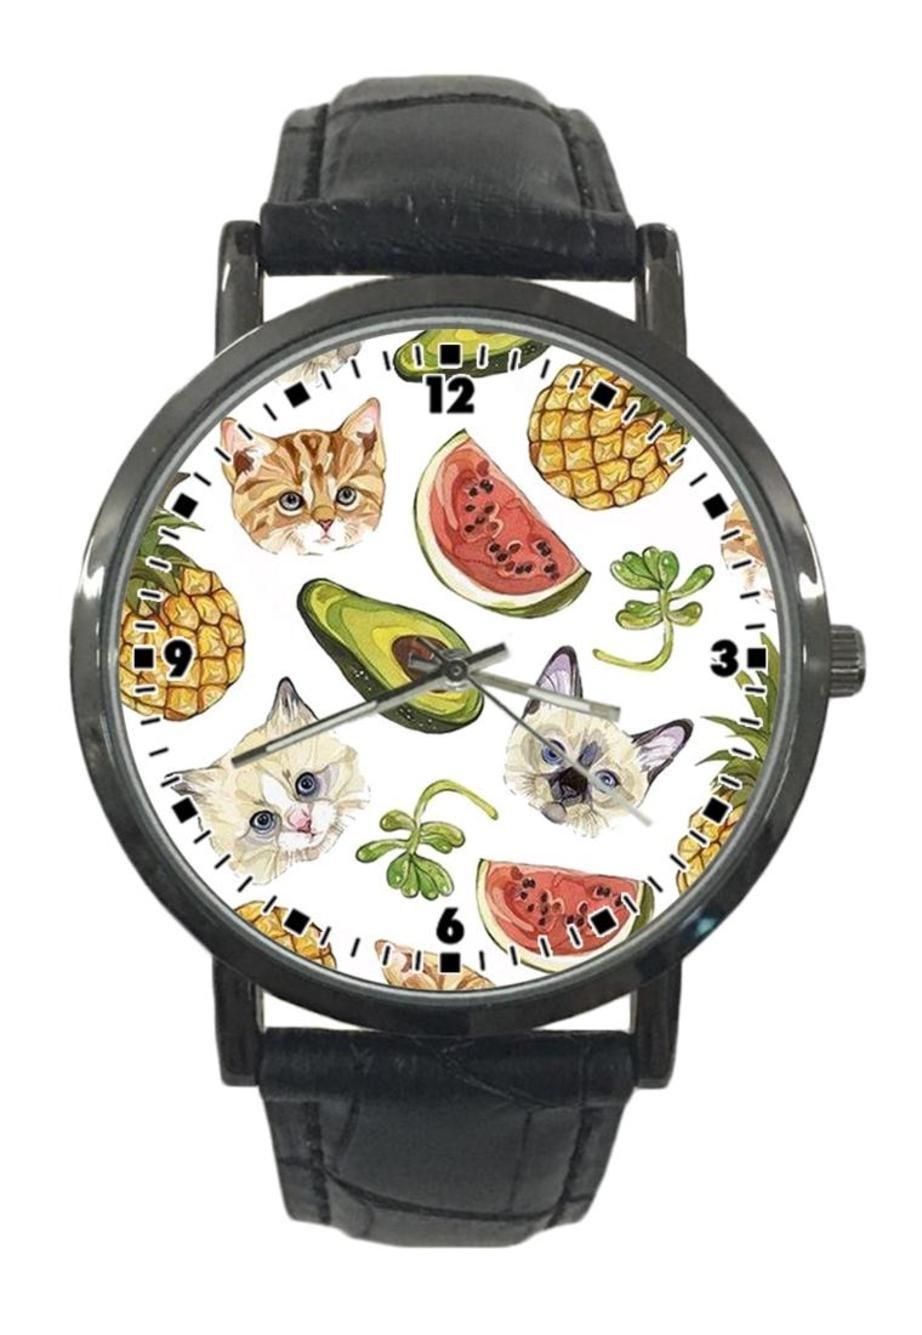 jkfgweeryhrt New Simple Fashion Cat Pineapple Watermelon Stainless Steel Leather Analog Quartz Sport Wrist Watch